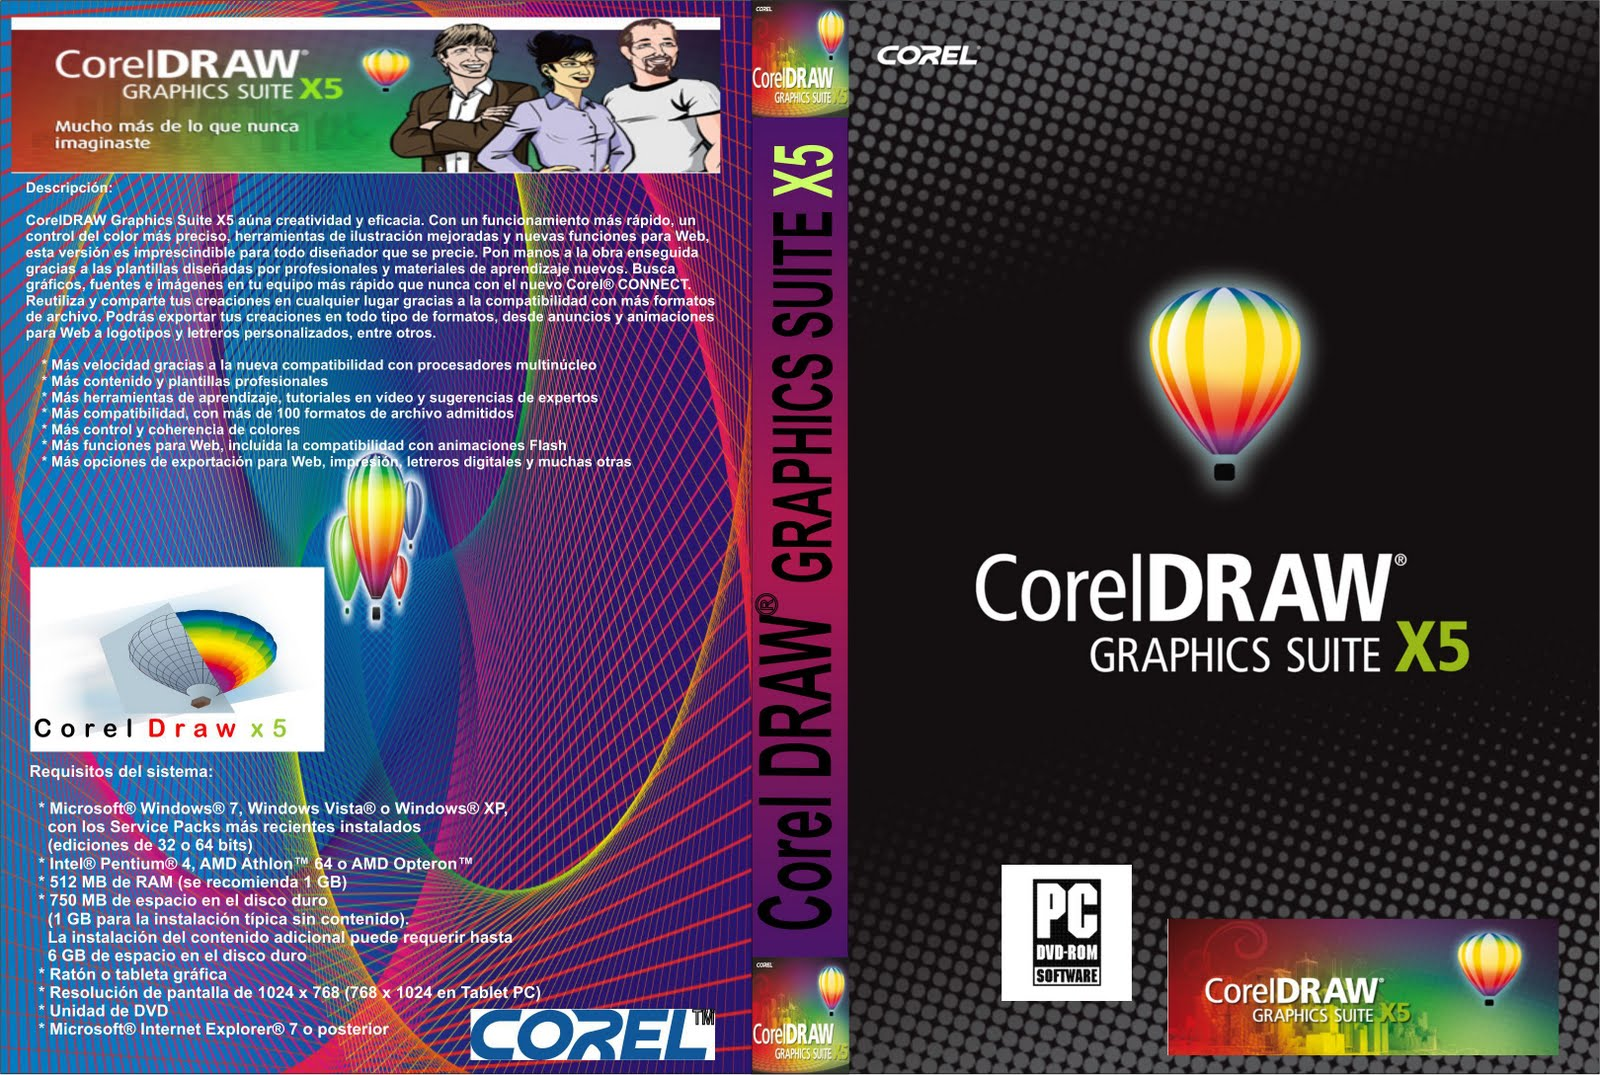 corel draw 13 full version torrent